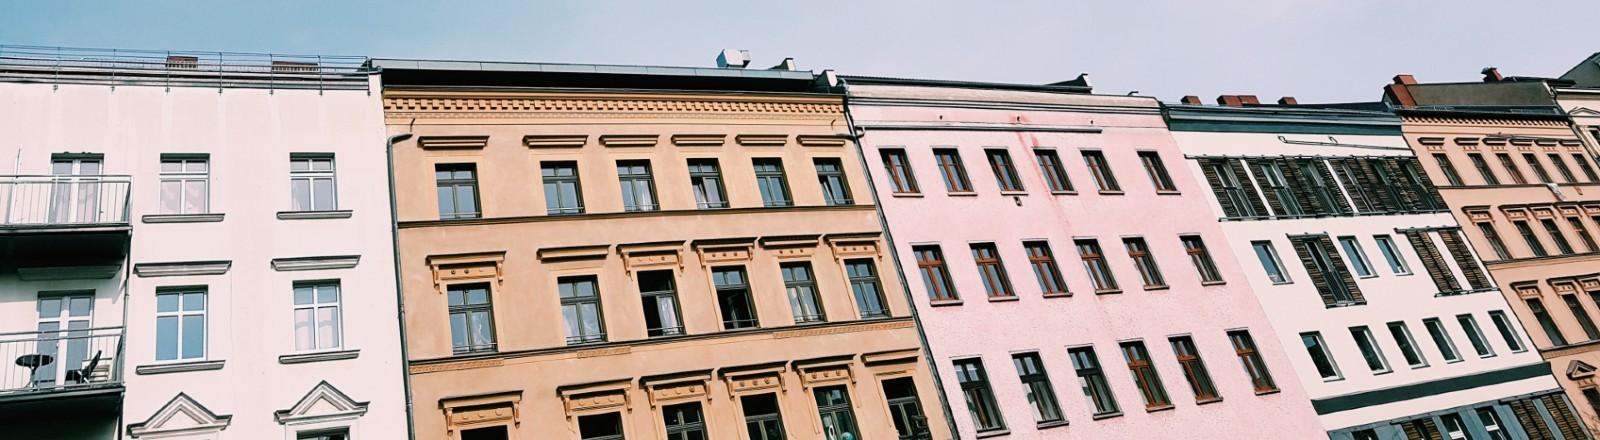 Häuserzeile in Berlin.